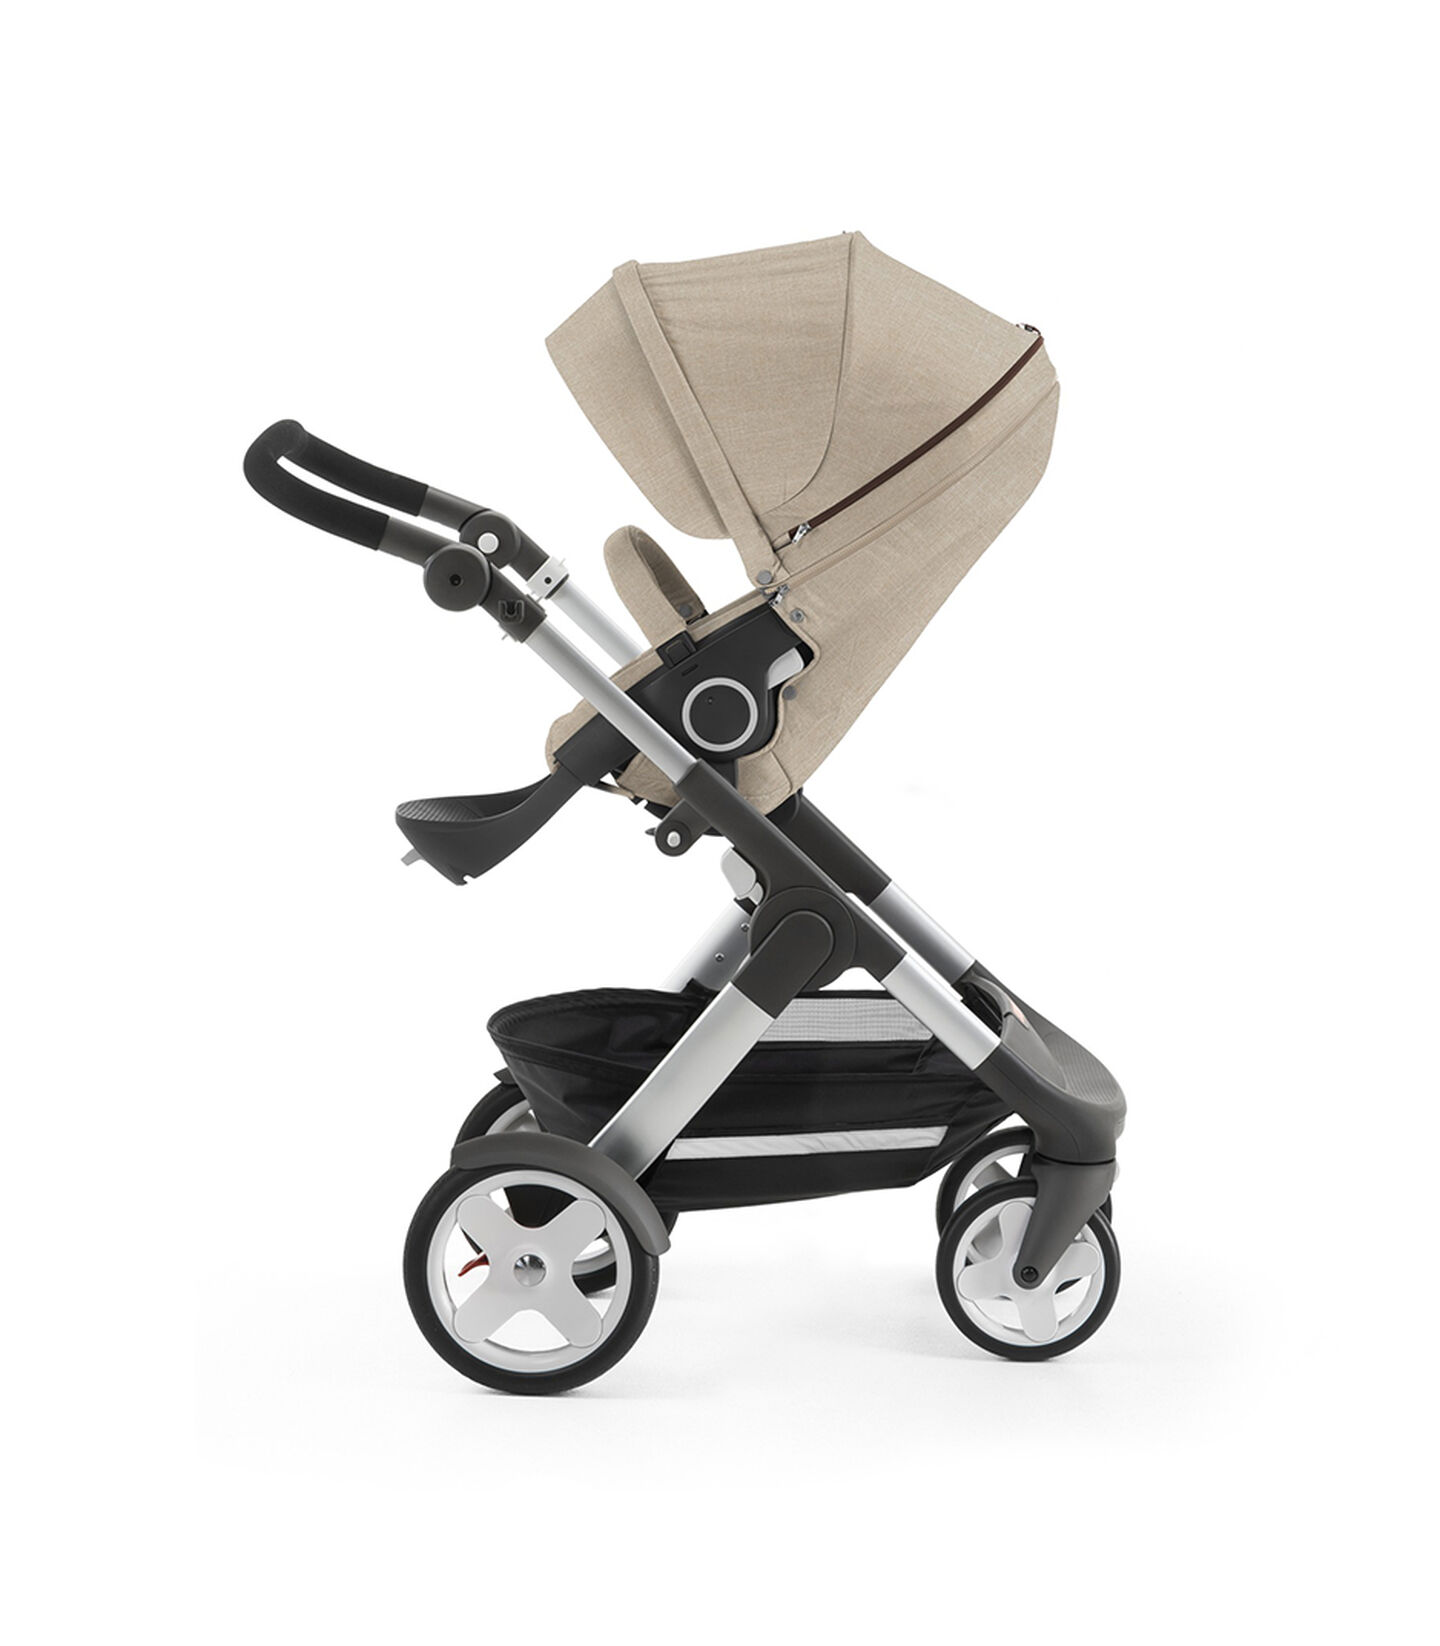 Stokke® Trailz™ with Stokke® Stroller Seat, Beige Melange. Classic Wheels. view 2